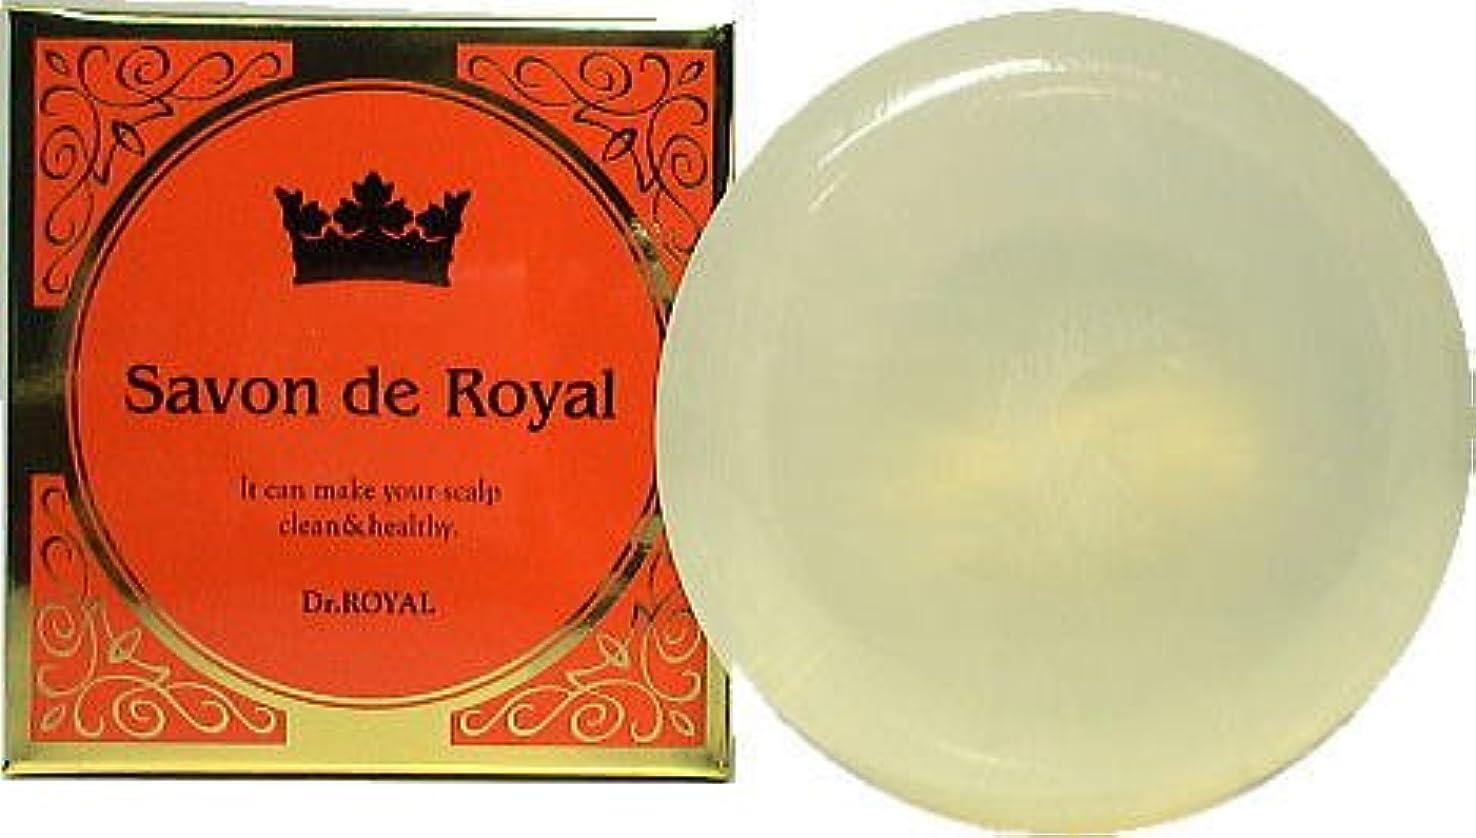 アジャ集中格納Savon de Royal 最高級石鹸